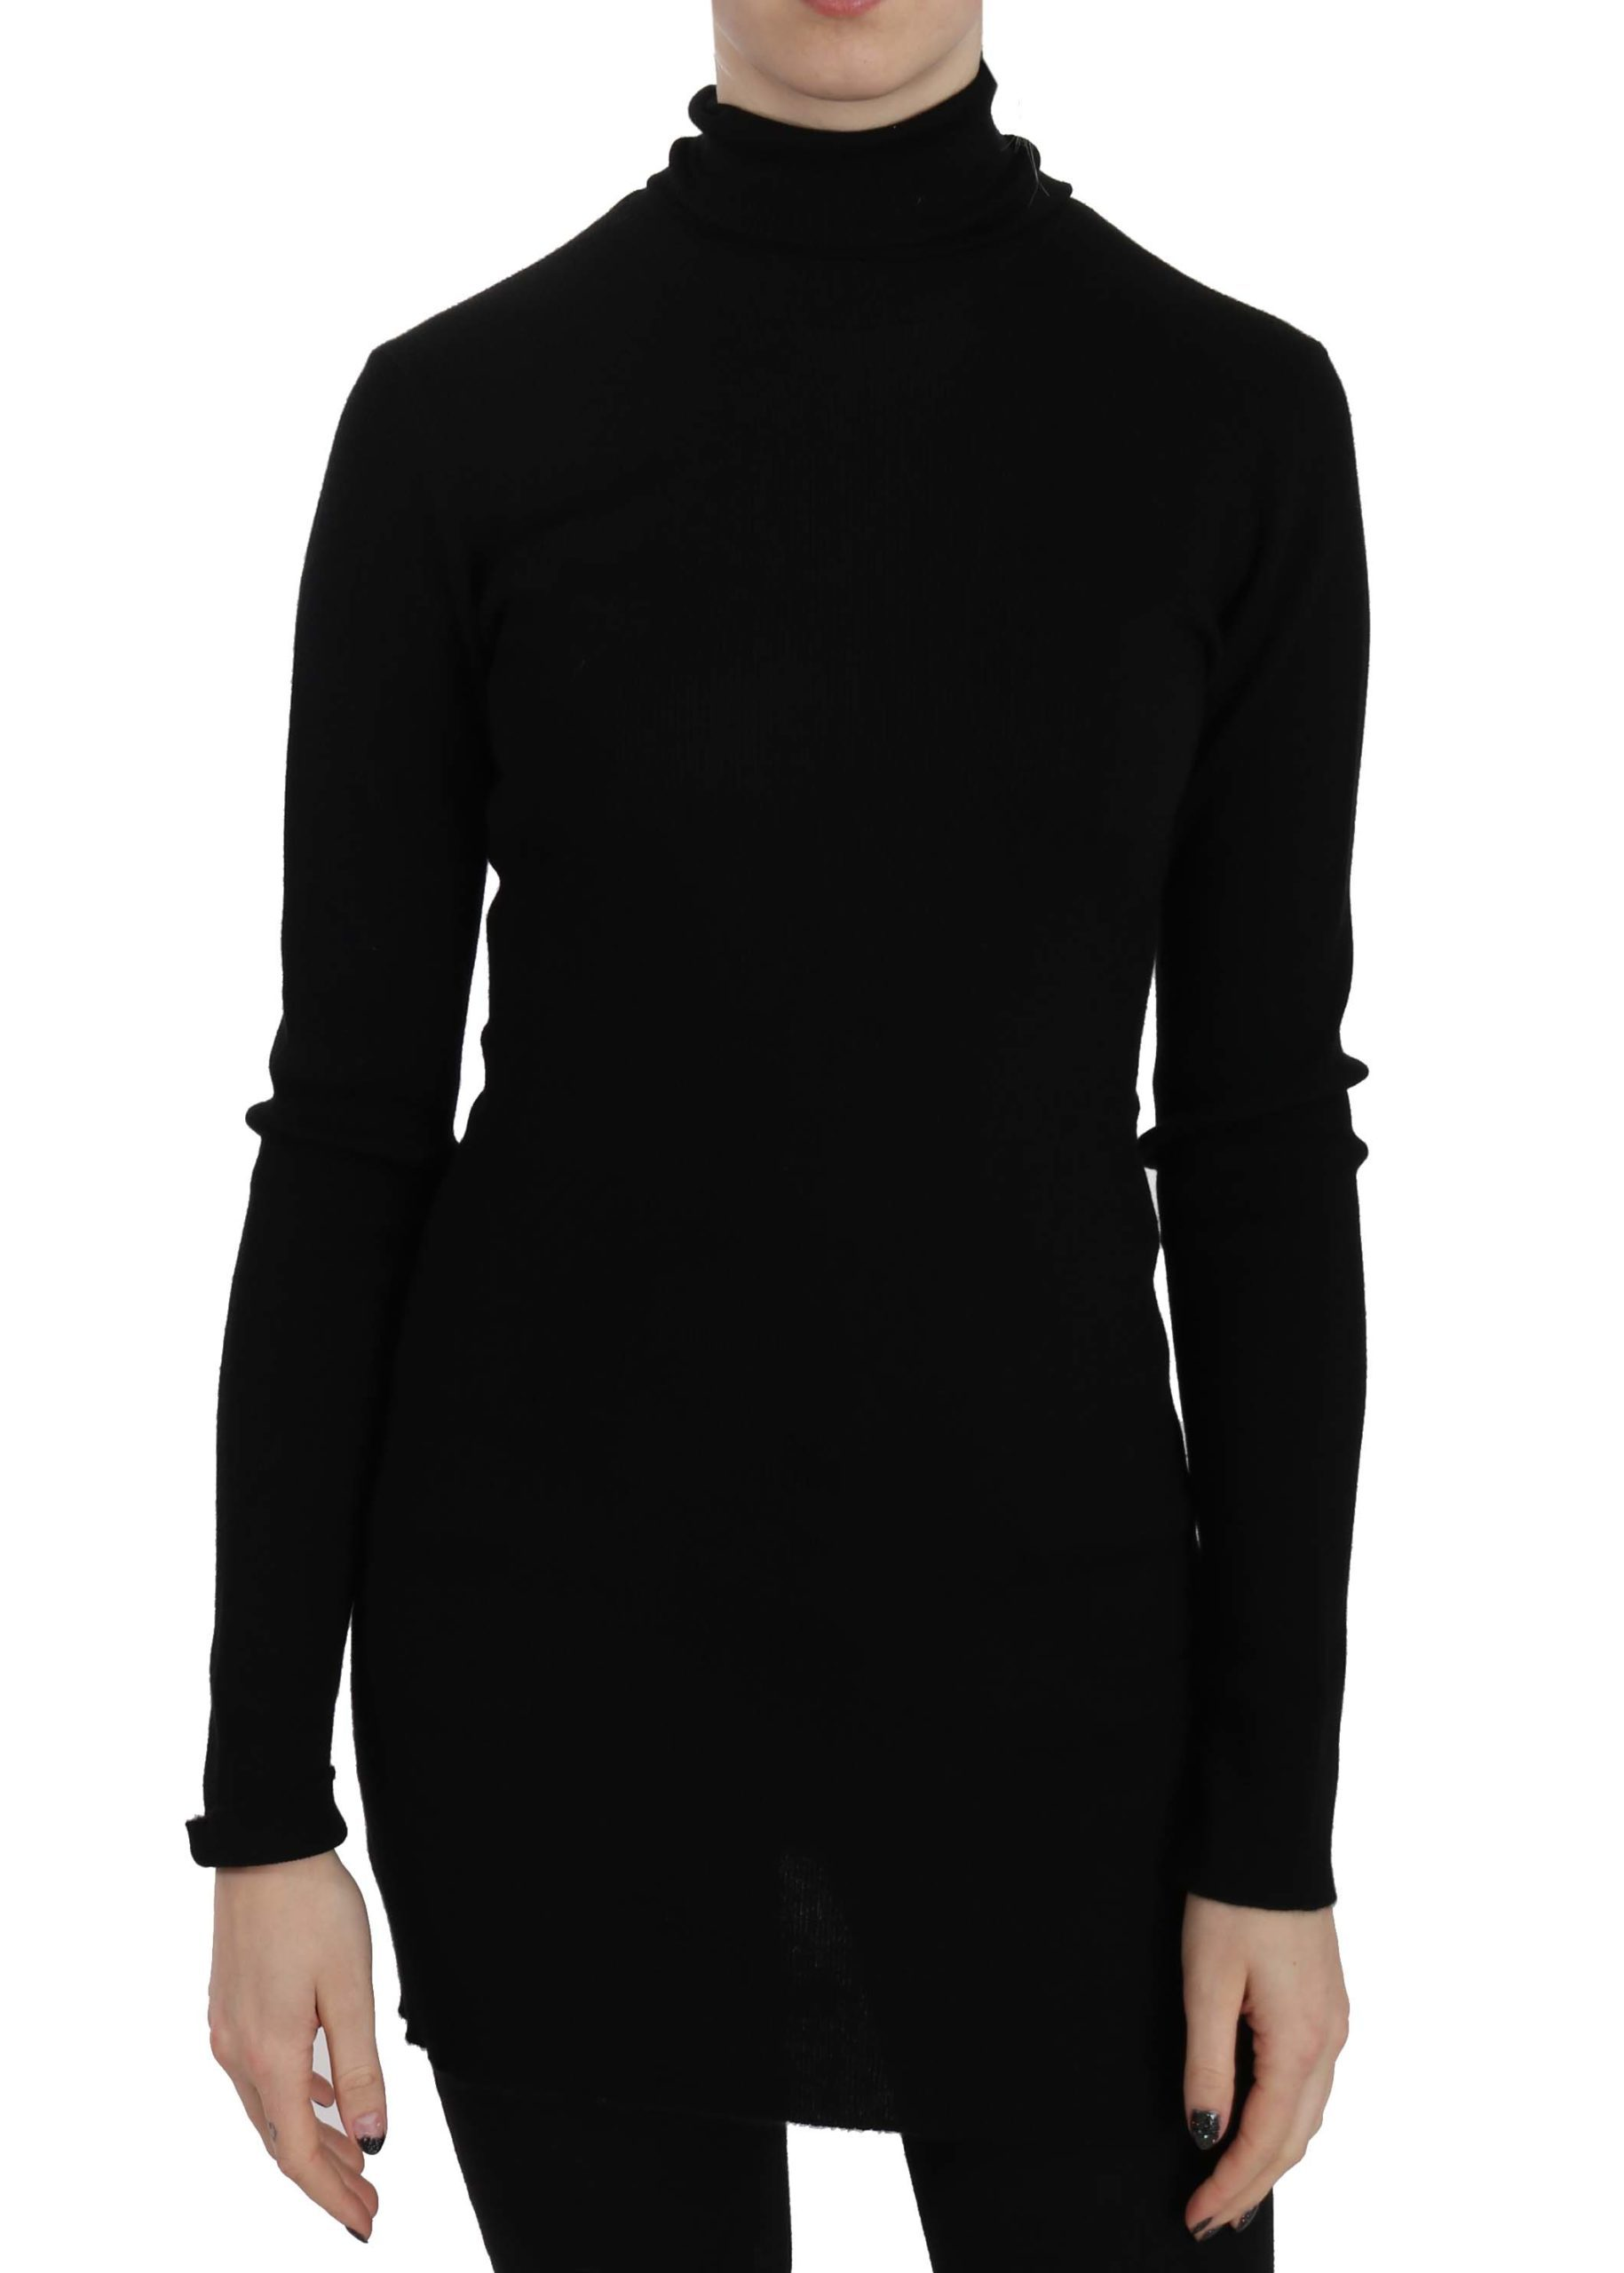 Dolce & Gabbana Women's Turtleneck Cashmere Pullover Sweater Black TSH3261 - IT38|XS